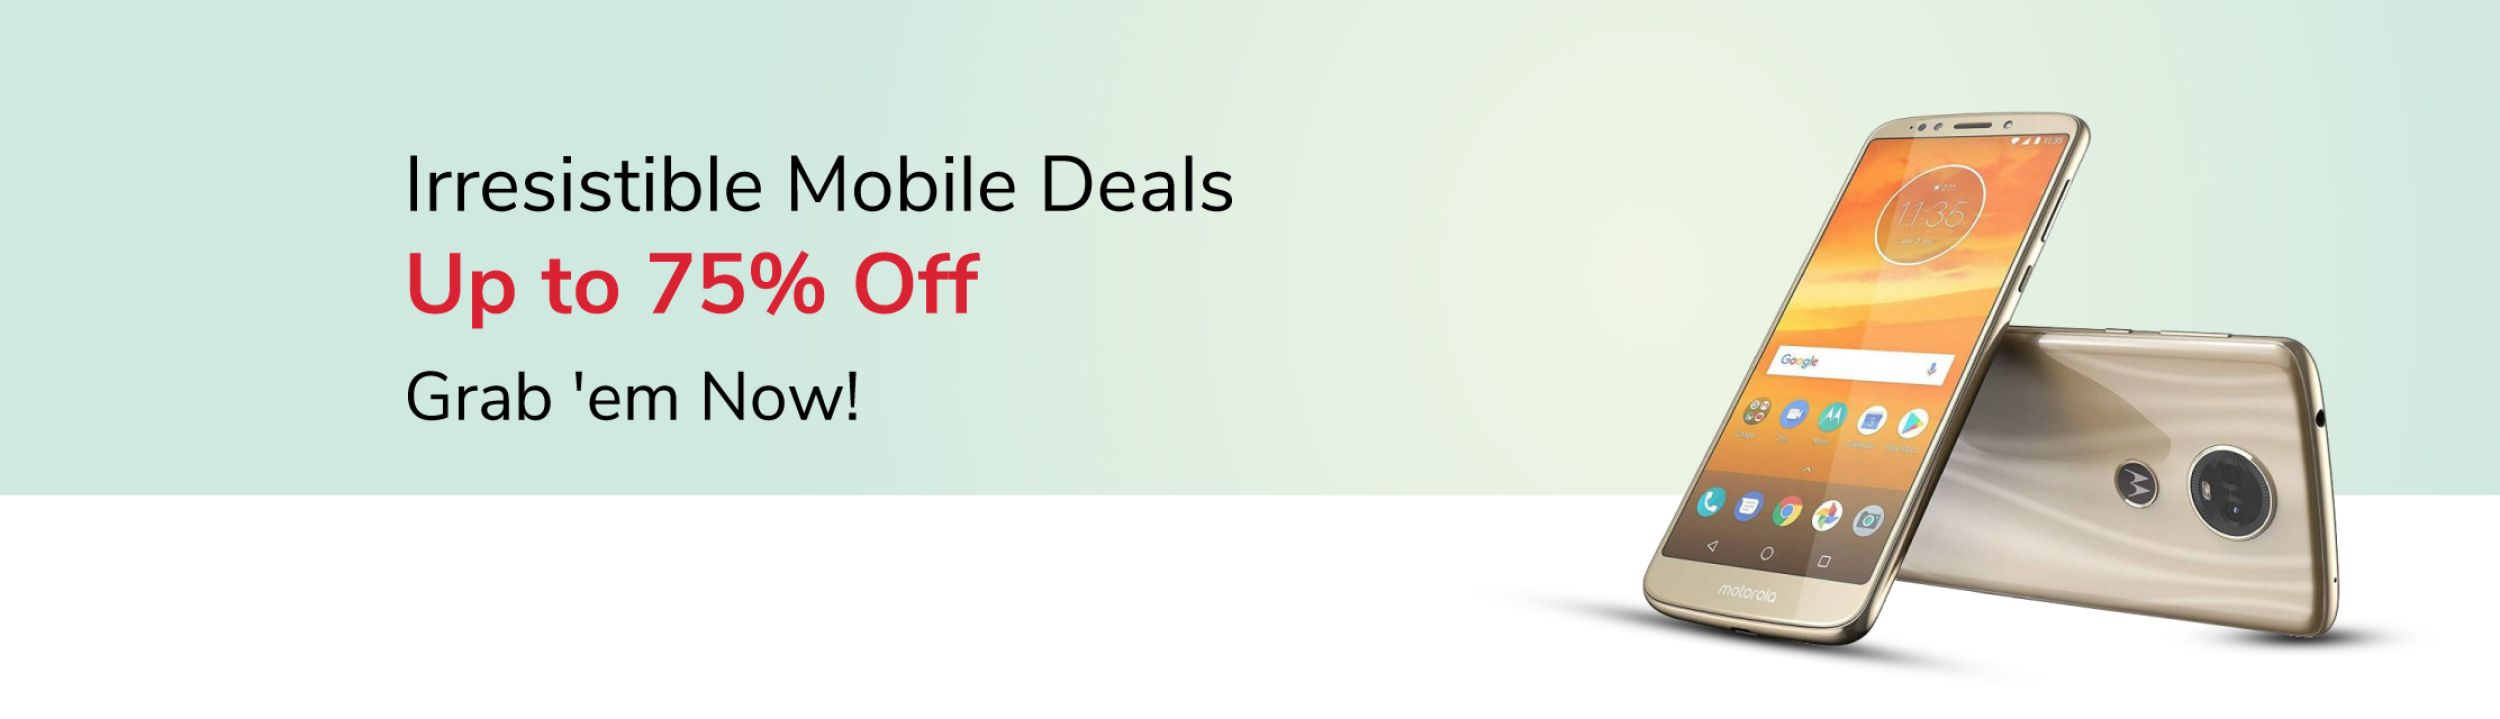 Refurbished Mobiles Store Online - Buy Refurbished Mobiles Online at